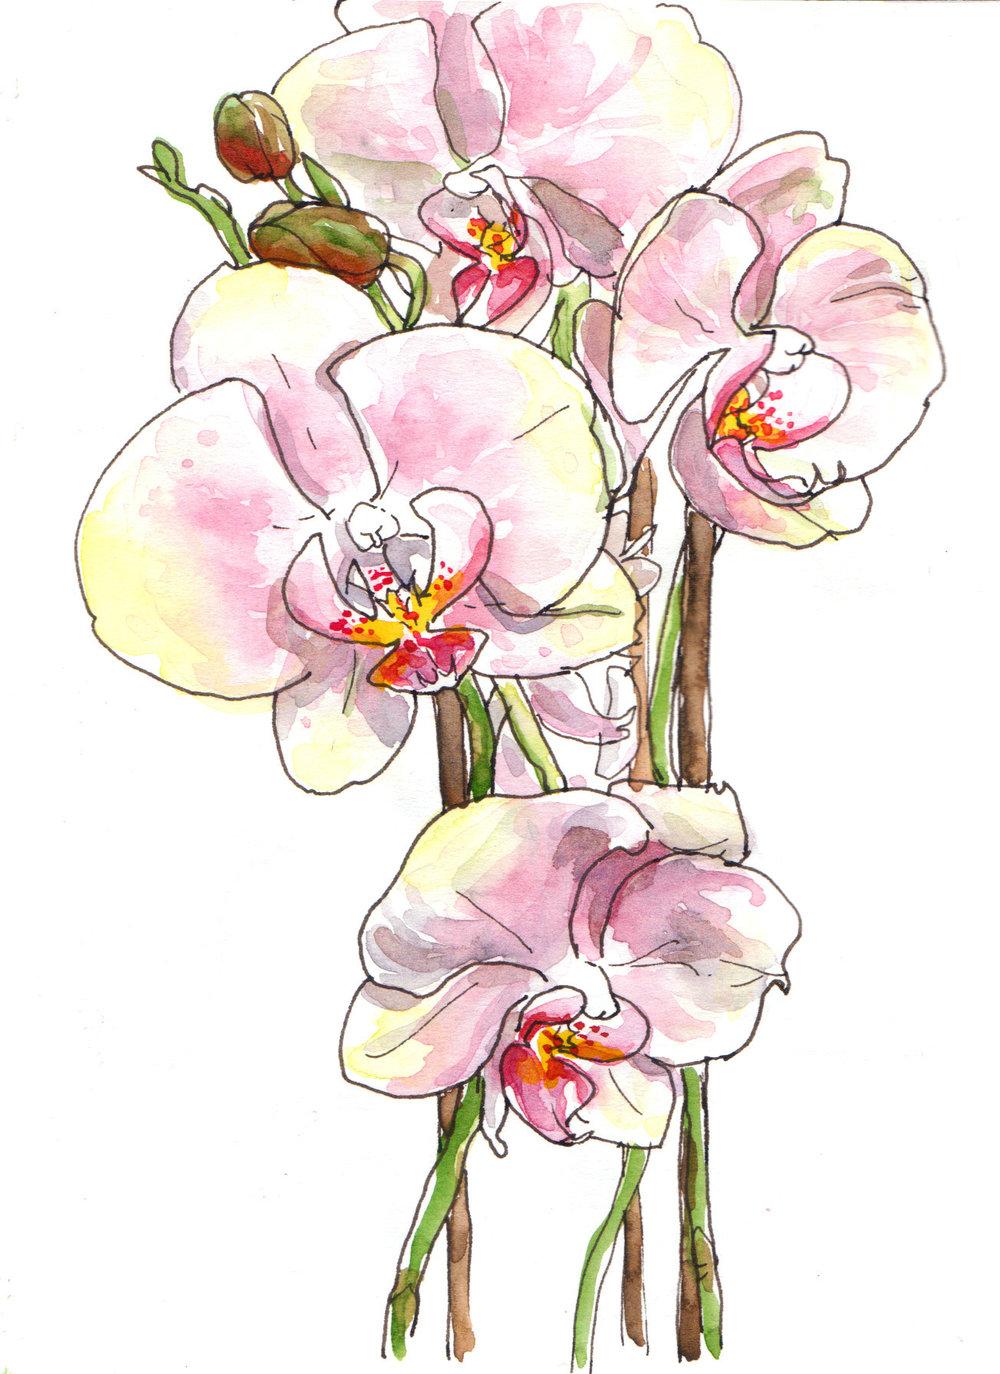 2013-05-03_Orchids.jpg